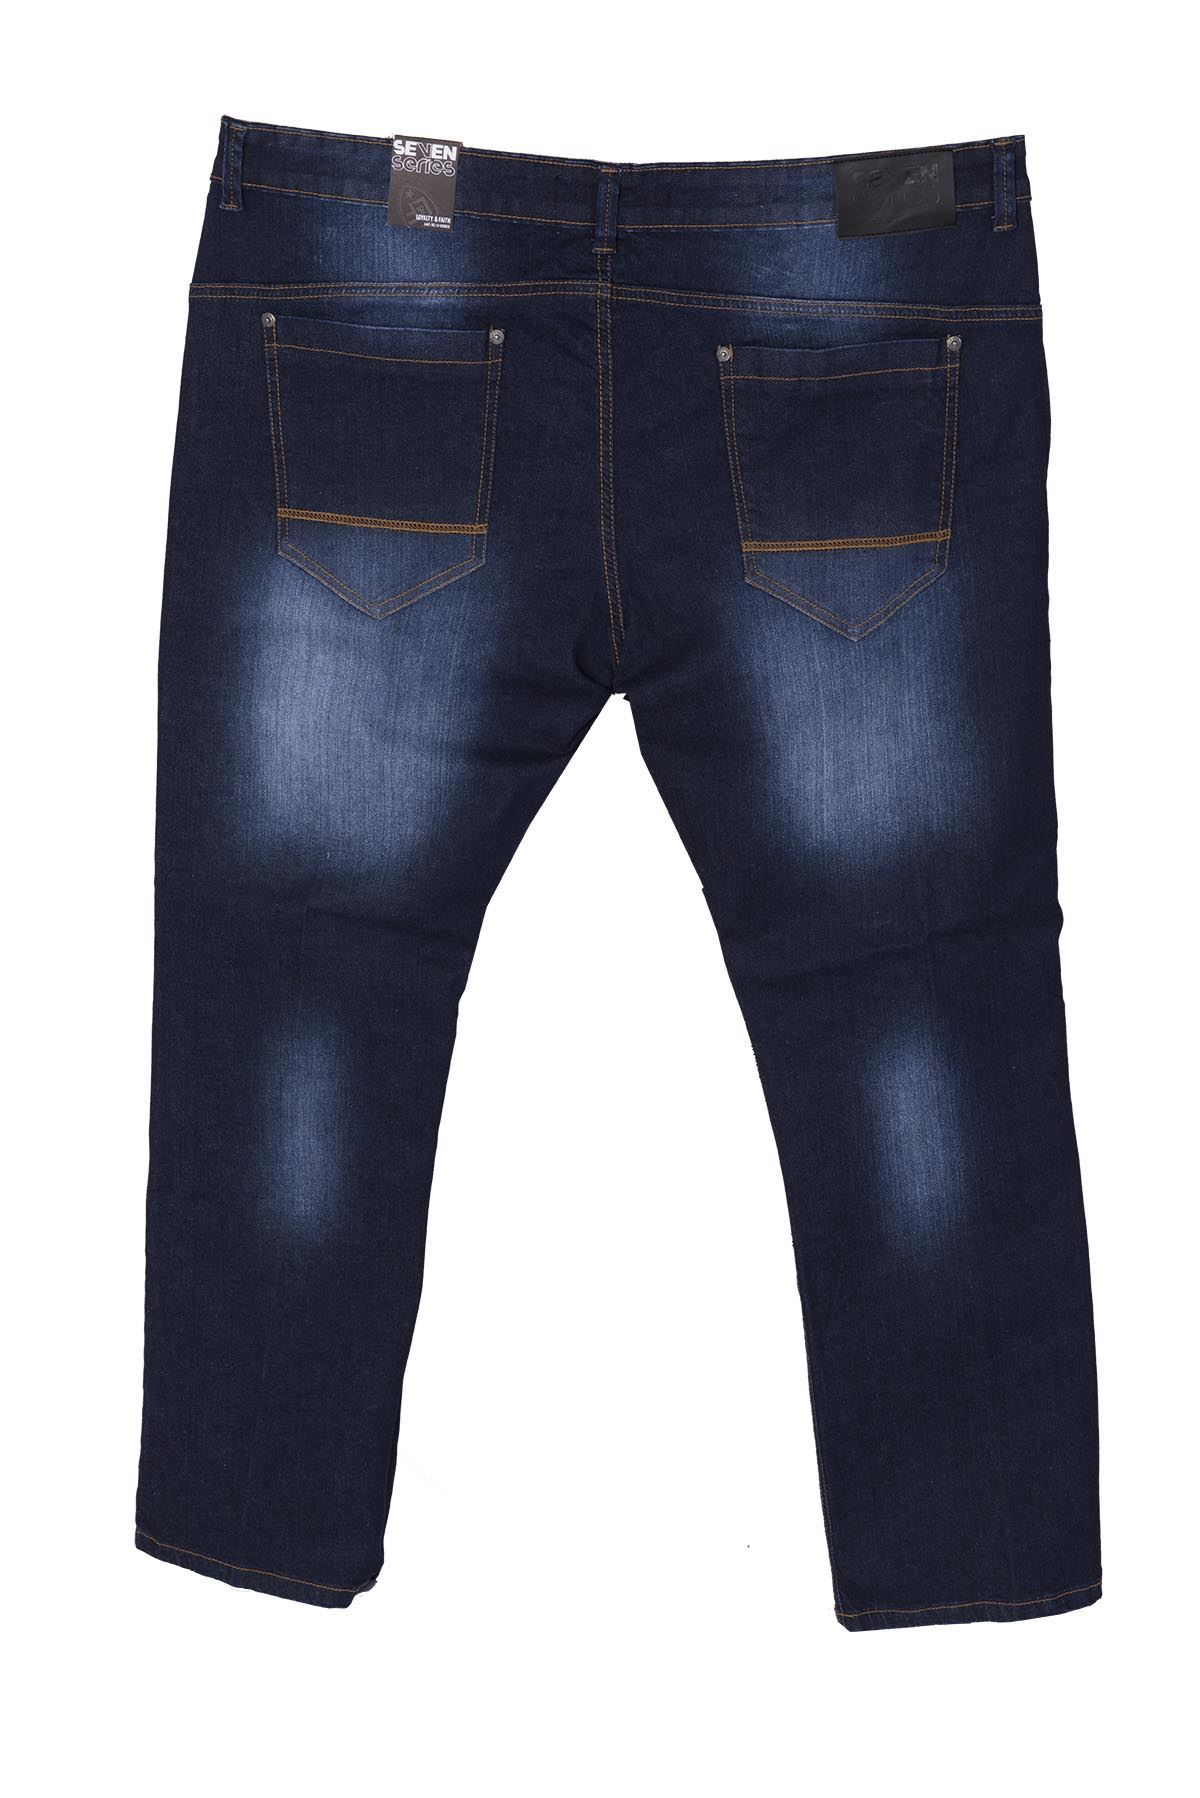 Big Mens Plus Size Stretch Jeans Zip Fly Light Dark Wash ... - photo#49